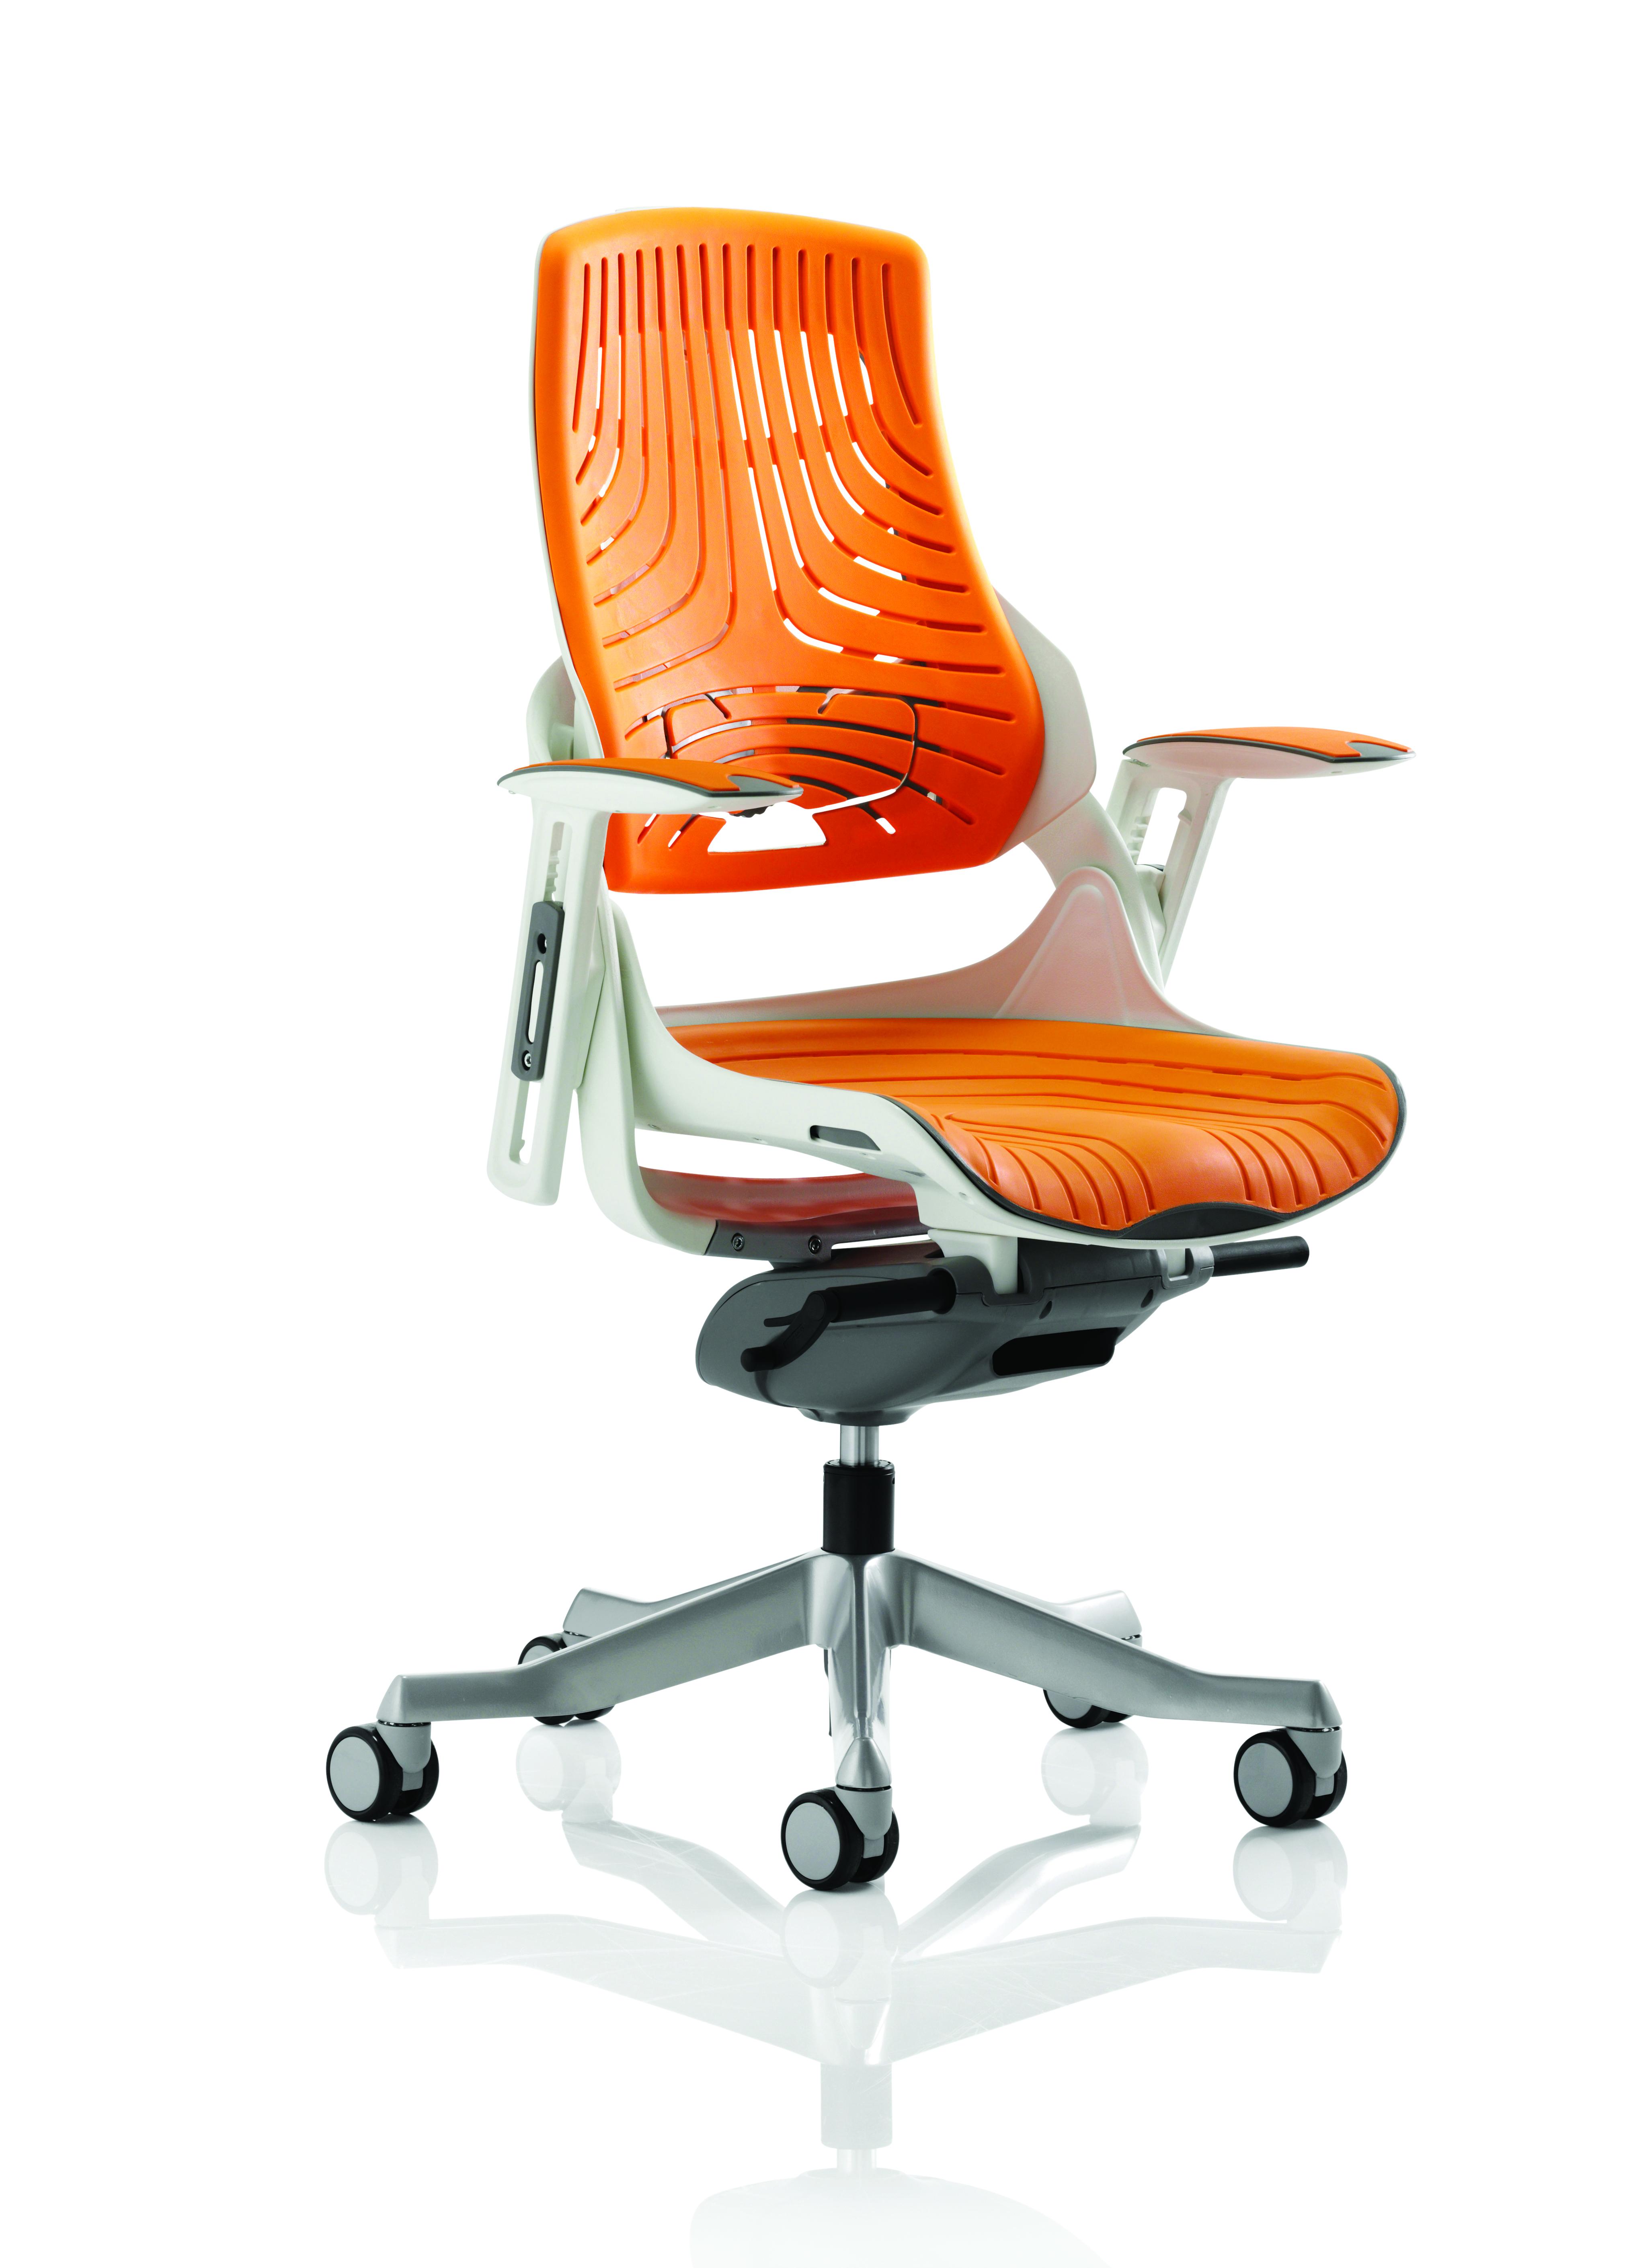 Executive Chairs Zure Elastomer Gel Orange With Arms EX000133